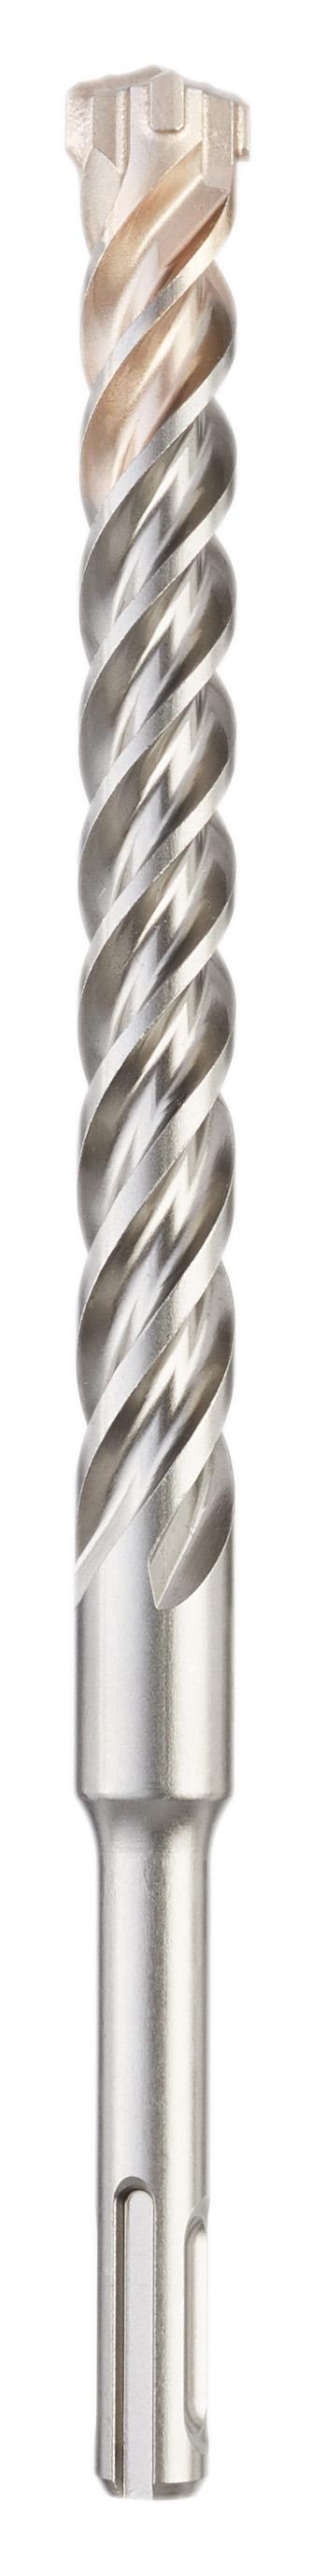 Milwaukee® 48-20-7228 4-Cutter Hammer Drill Bit, 7/8 in, SDS-Plus Shank, 10 in OAL